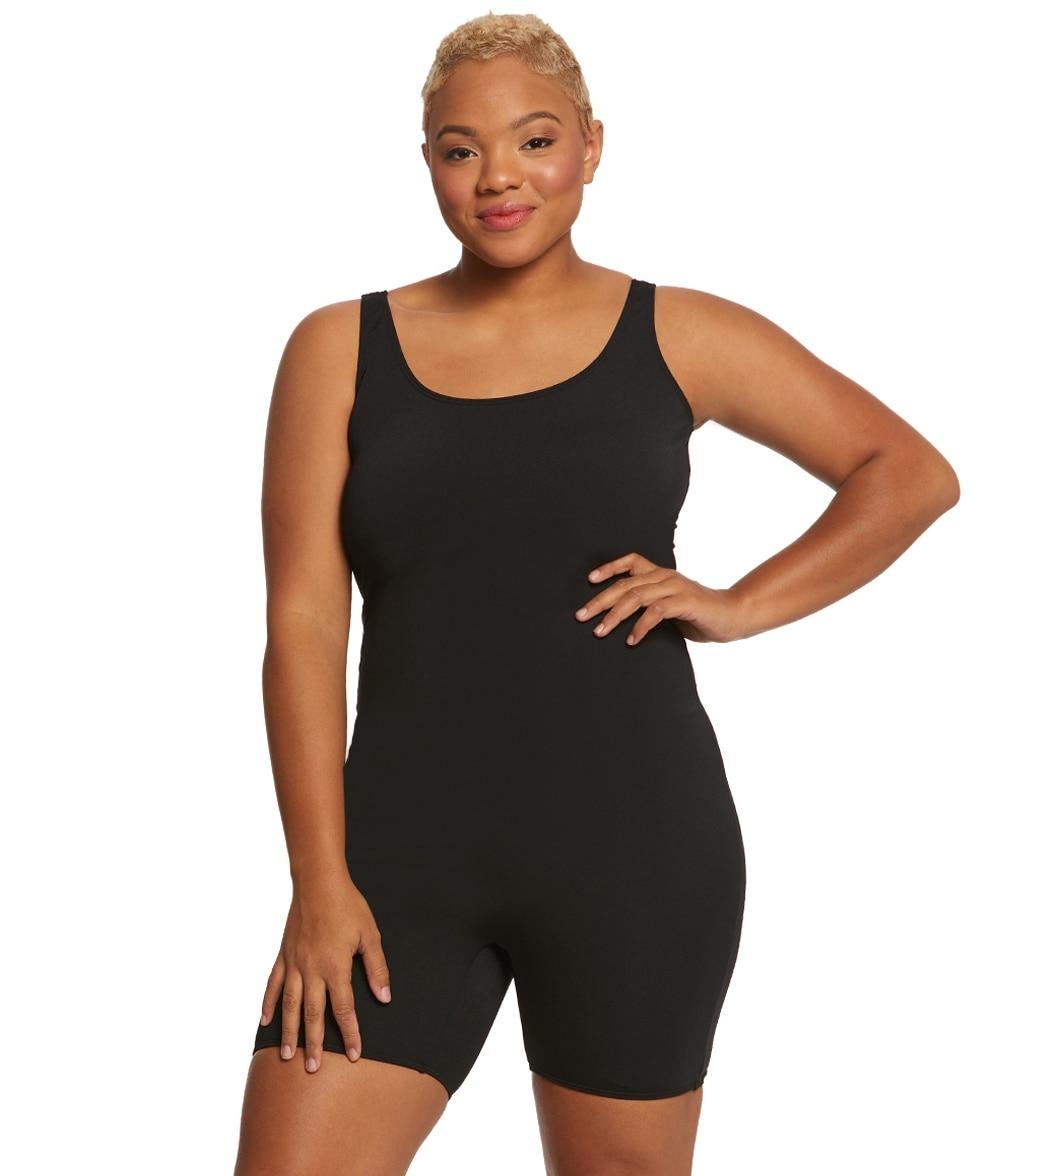 aaea122ad9 Sporti Plus Size Lia Chlorine Resistant Scoop Back Unitard One Piece  Swimsuit at SwimOutlet.com